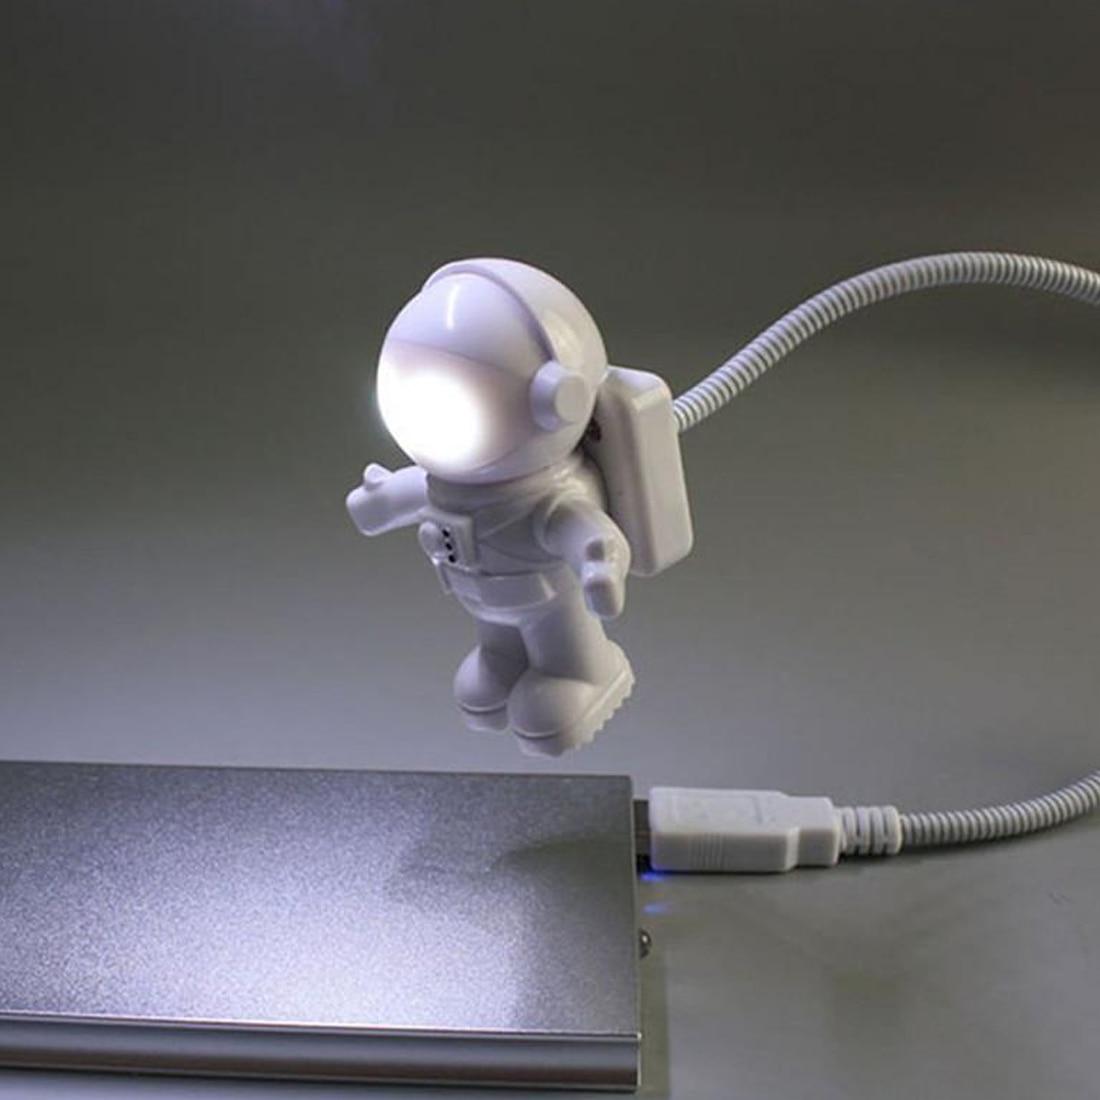 Cute Astronaut Style Computer USB Light Lamp Flexible Bulb for Laptop PC Reading Laptop Accessories Tablet Accessories